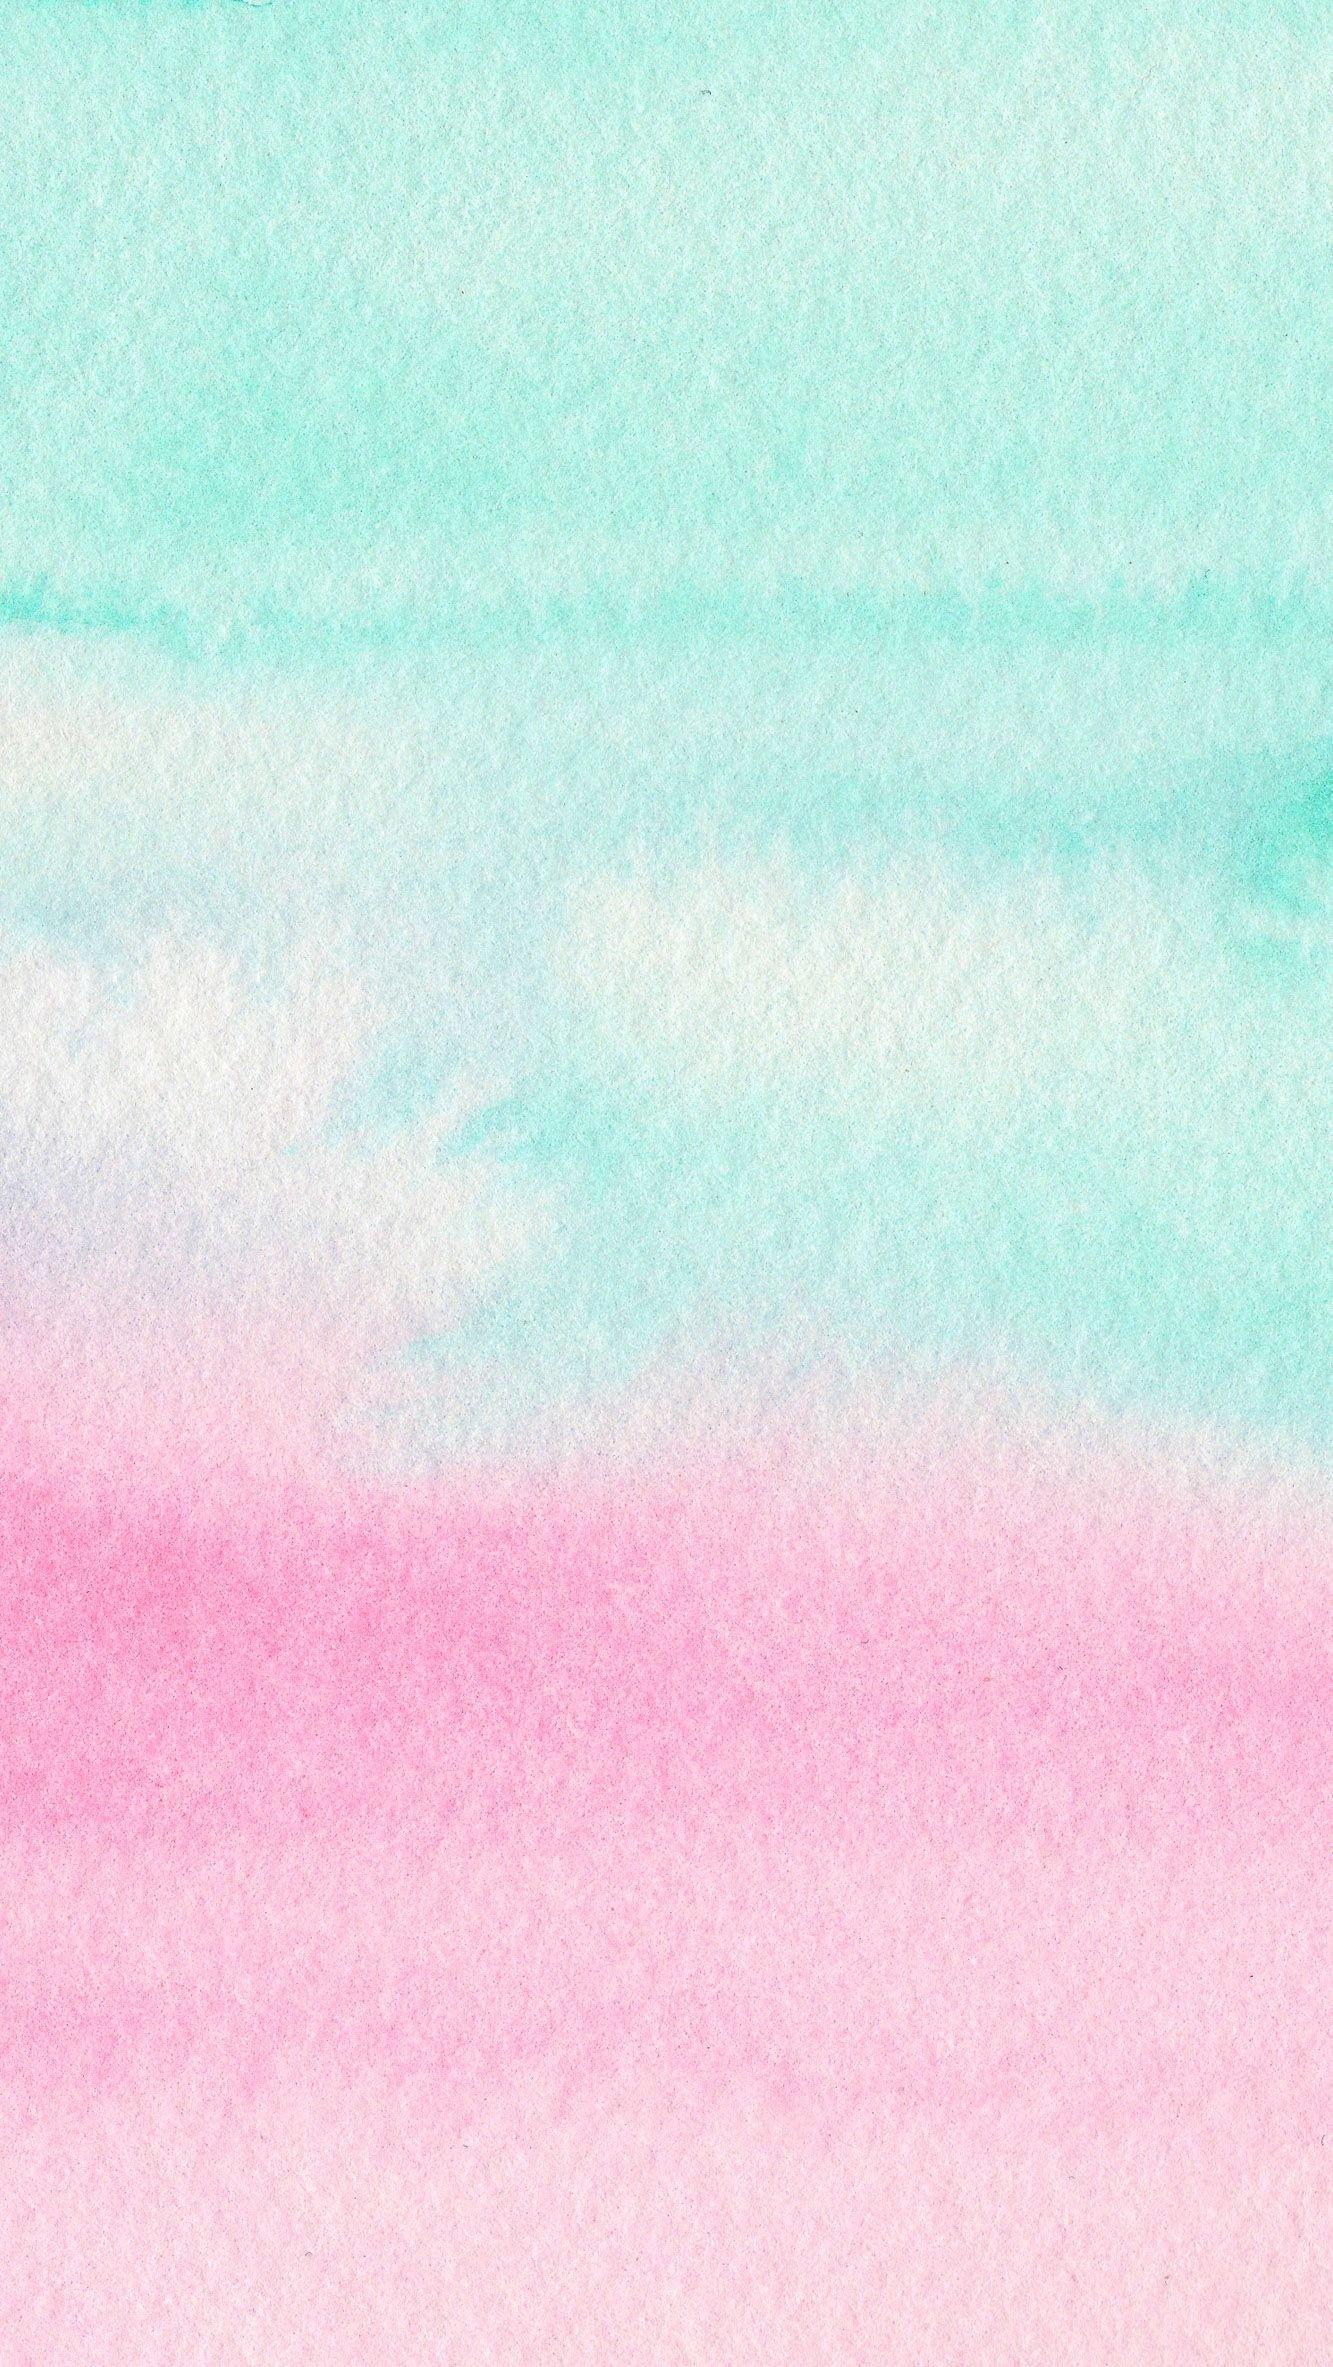 Res: 1333x2367, ... Ombre Tumblr Background New Wallpaper 005 iPhone 1 333—2 367 Pixels ...